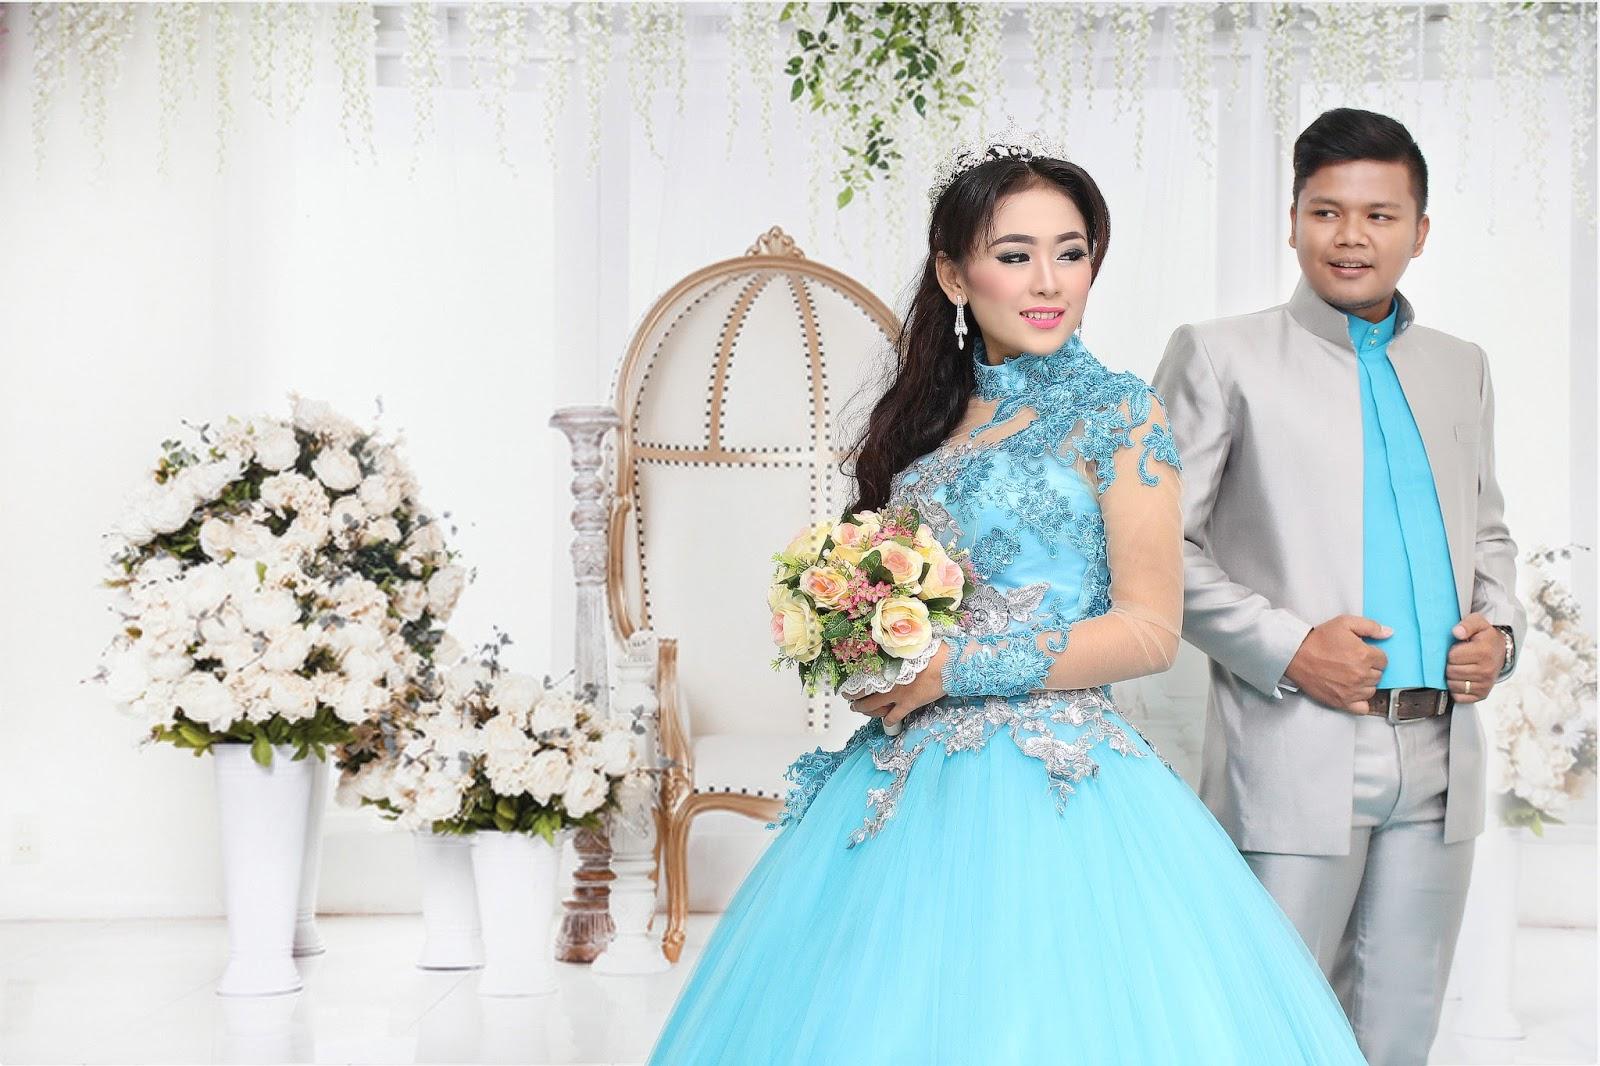 foto wedding prewedding pernikahan murah depok cibubur jakarta